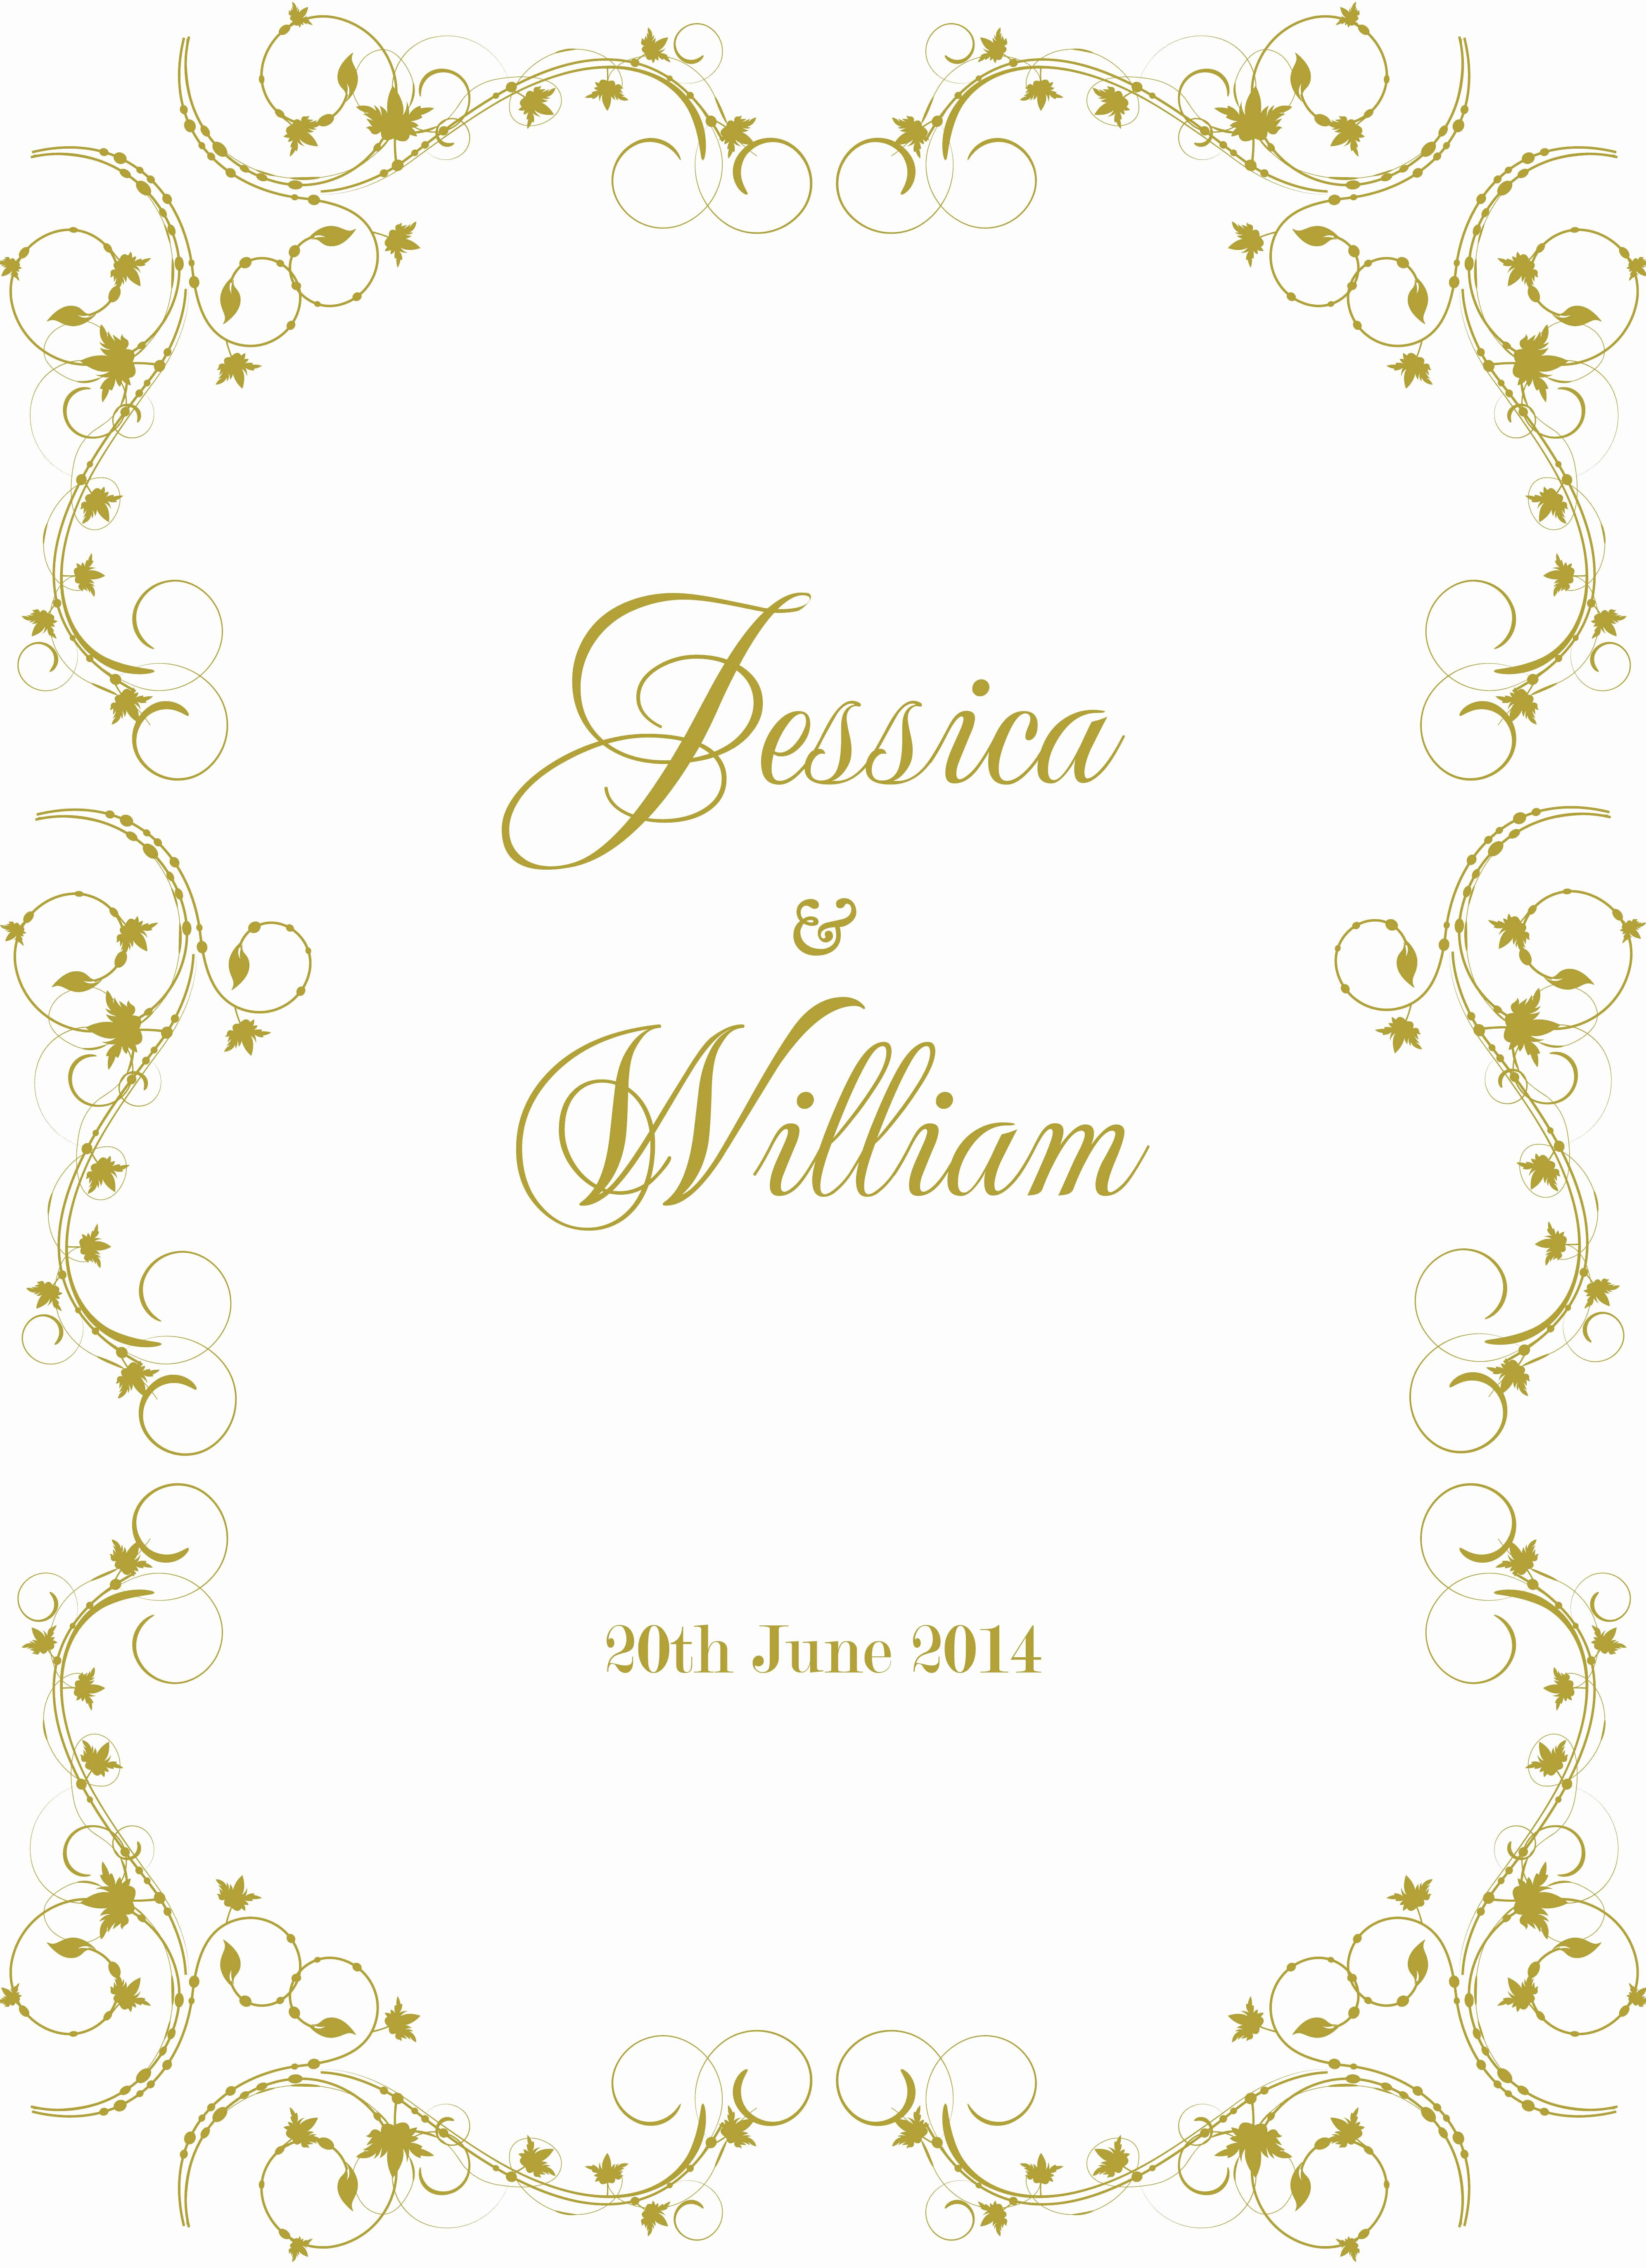 Wedding Invitation Border Designs Fresh Free Invitation Borders Download Free Clip Art Free Clip